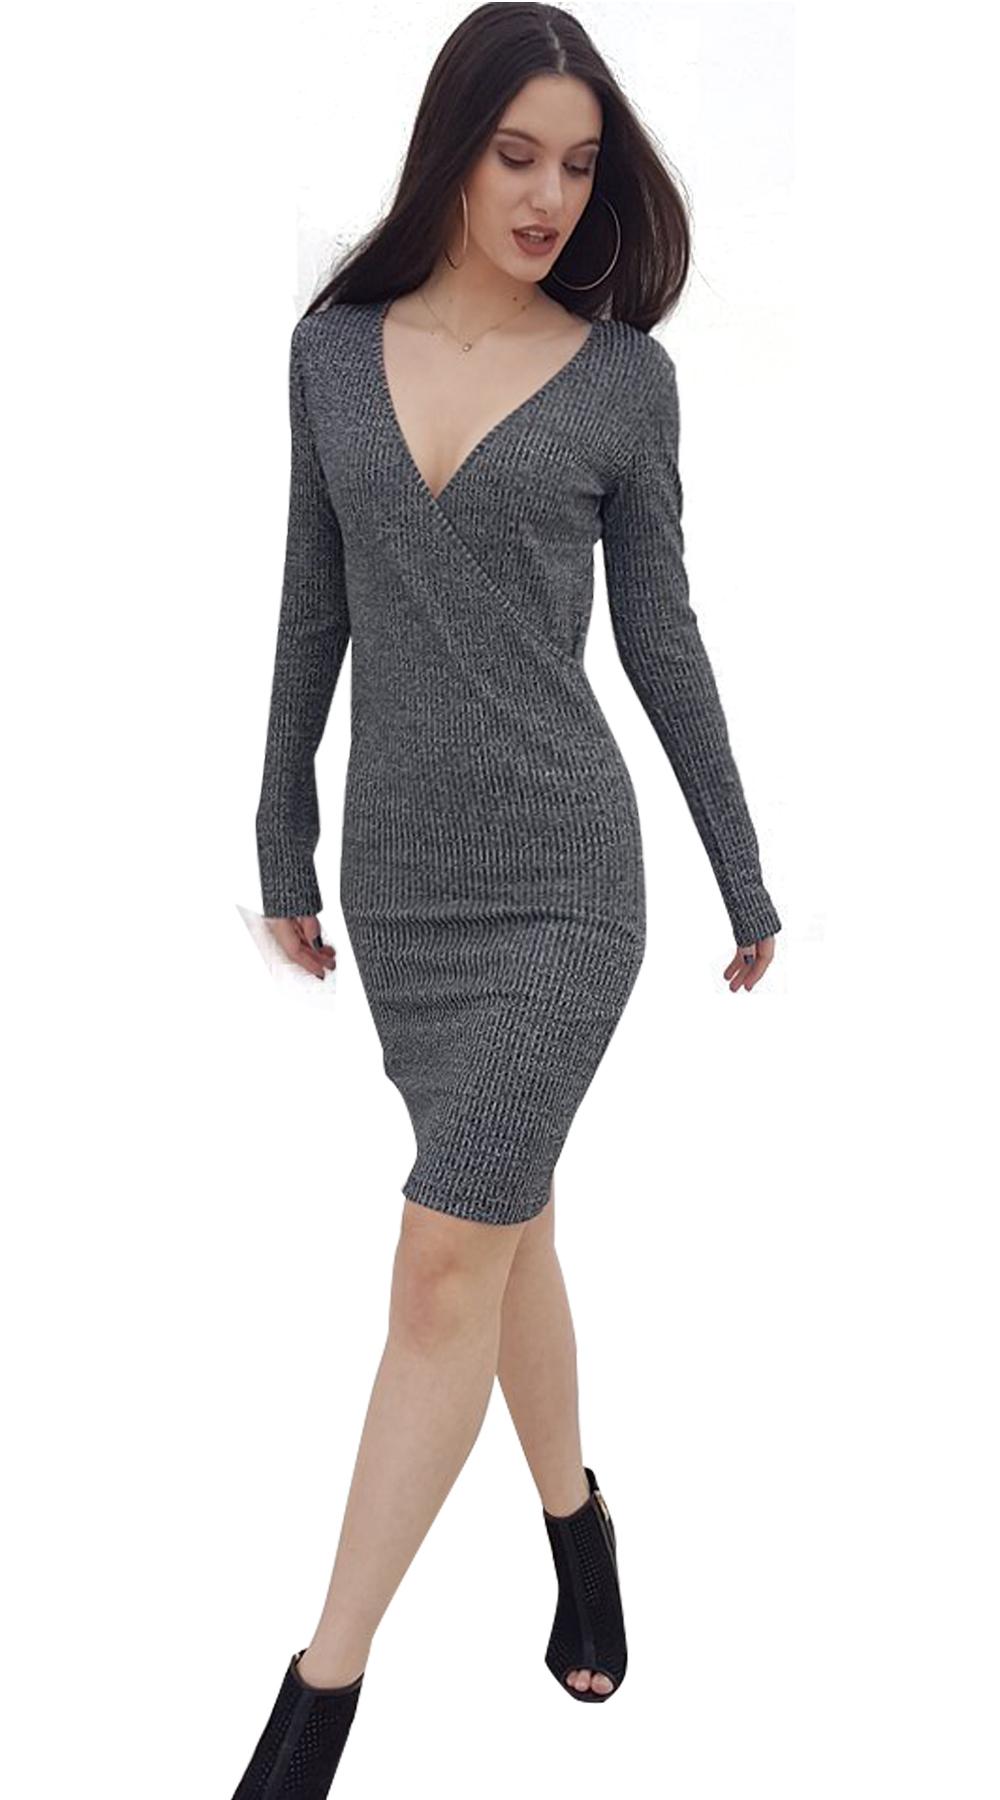 575afa1befaf Μίνι basic φόρεμα κρουαζέ ελαστικό Online - ONLINE - W18ON-52034